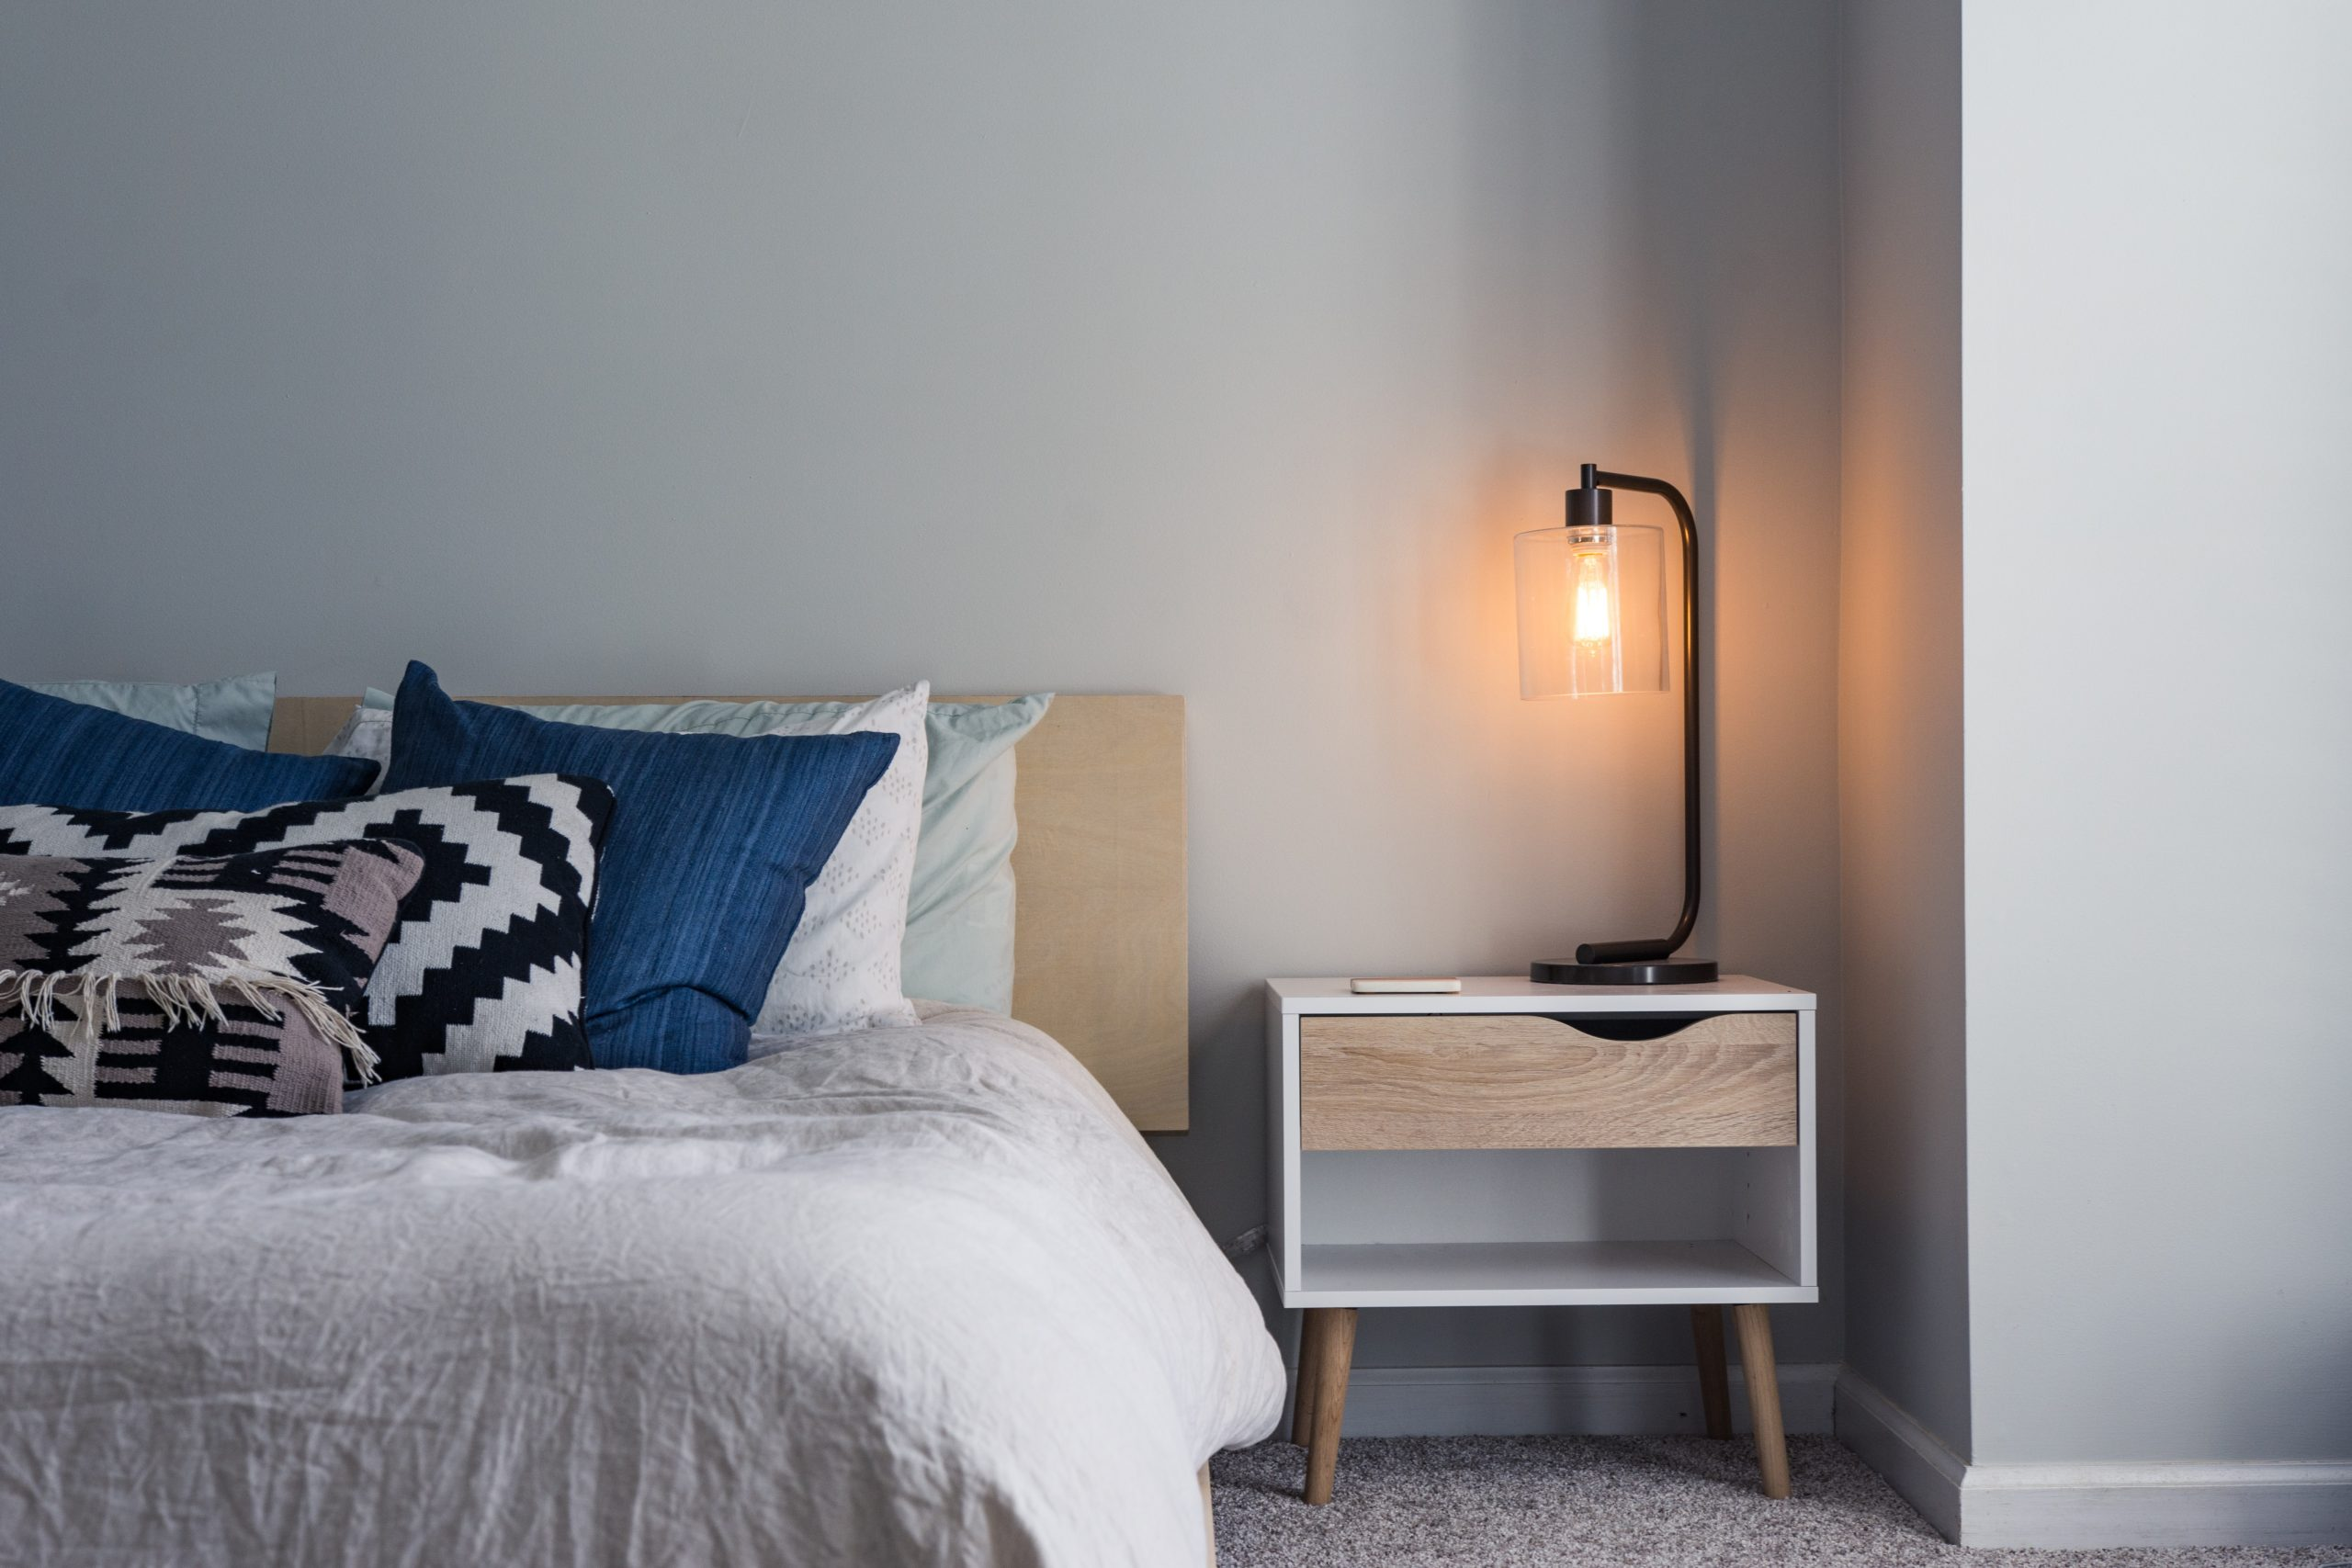 Home staging : comment refaire les chambres ?